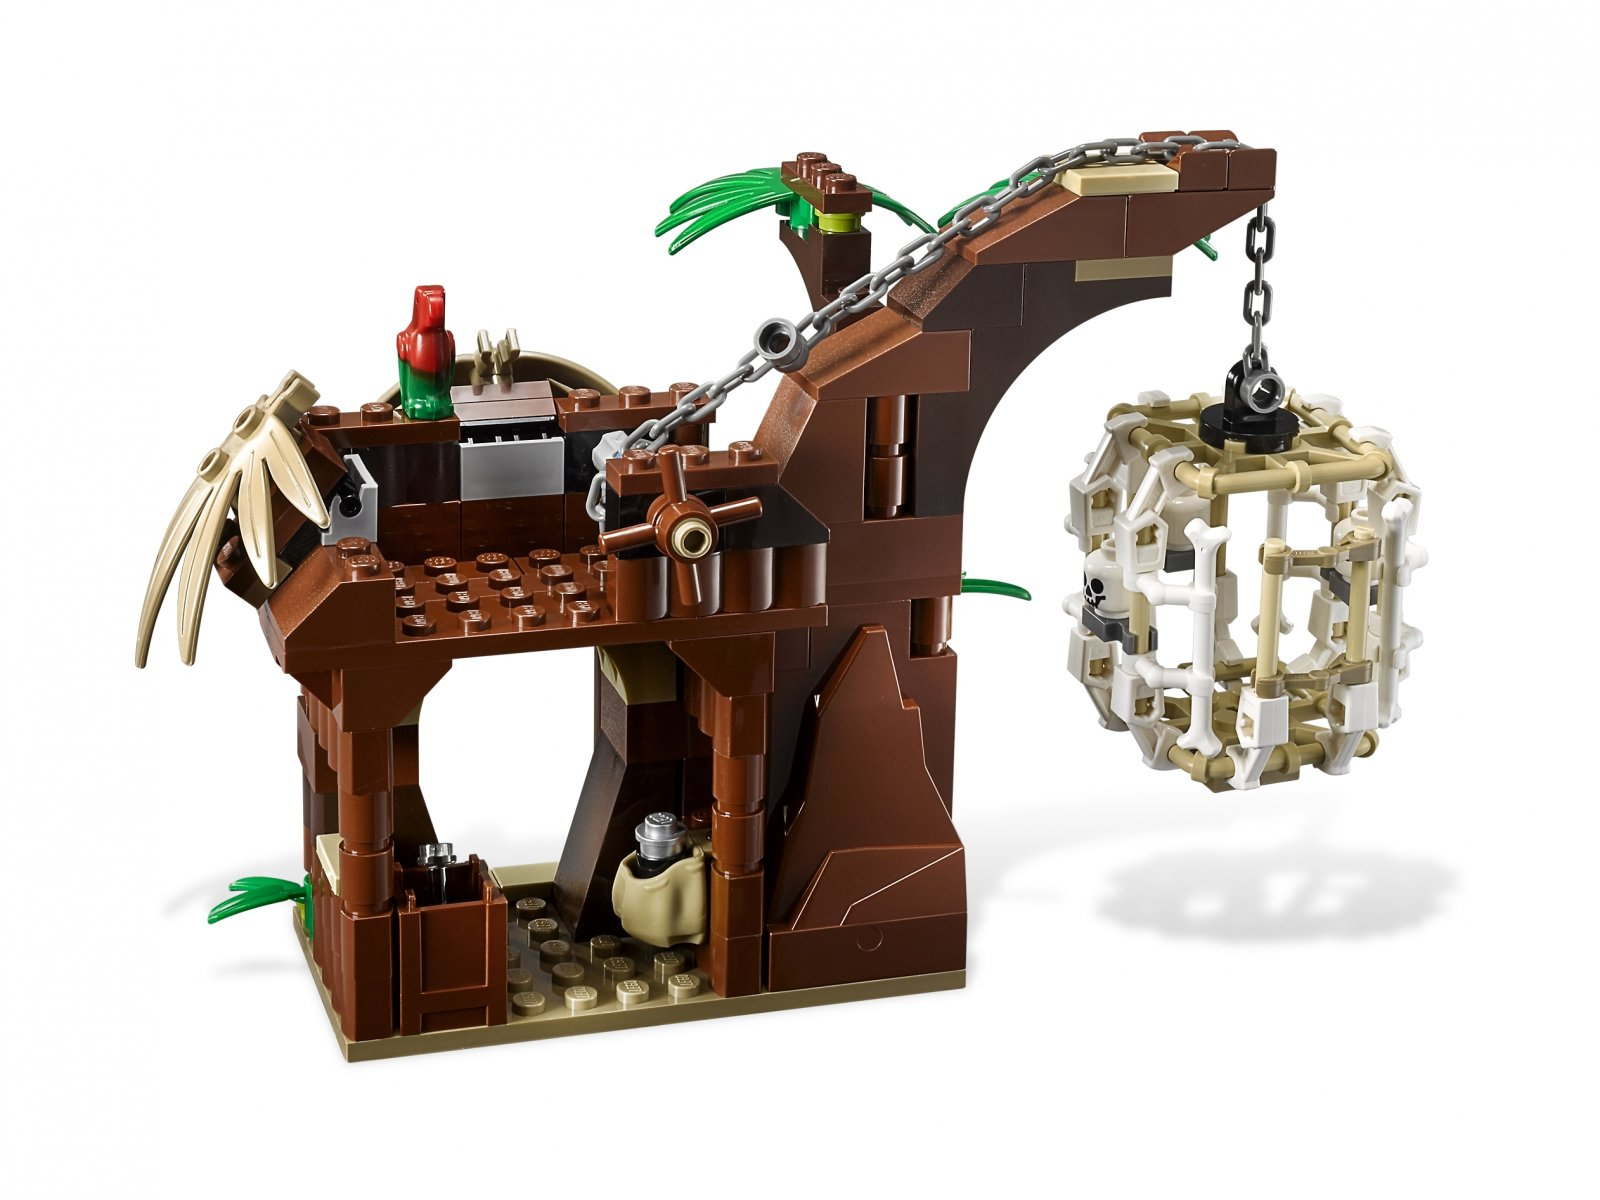 LEGO 4182 The Cannibal Escape